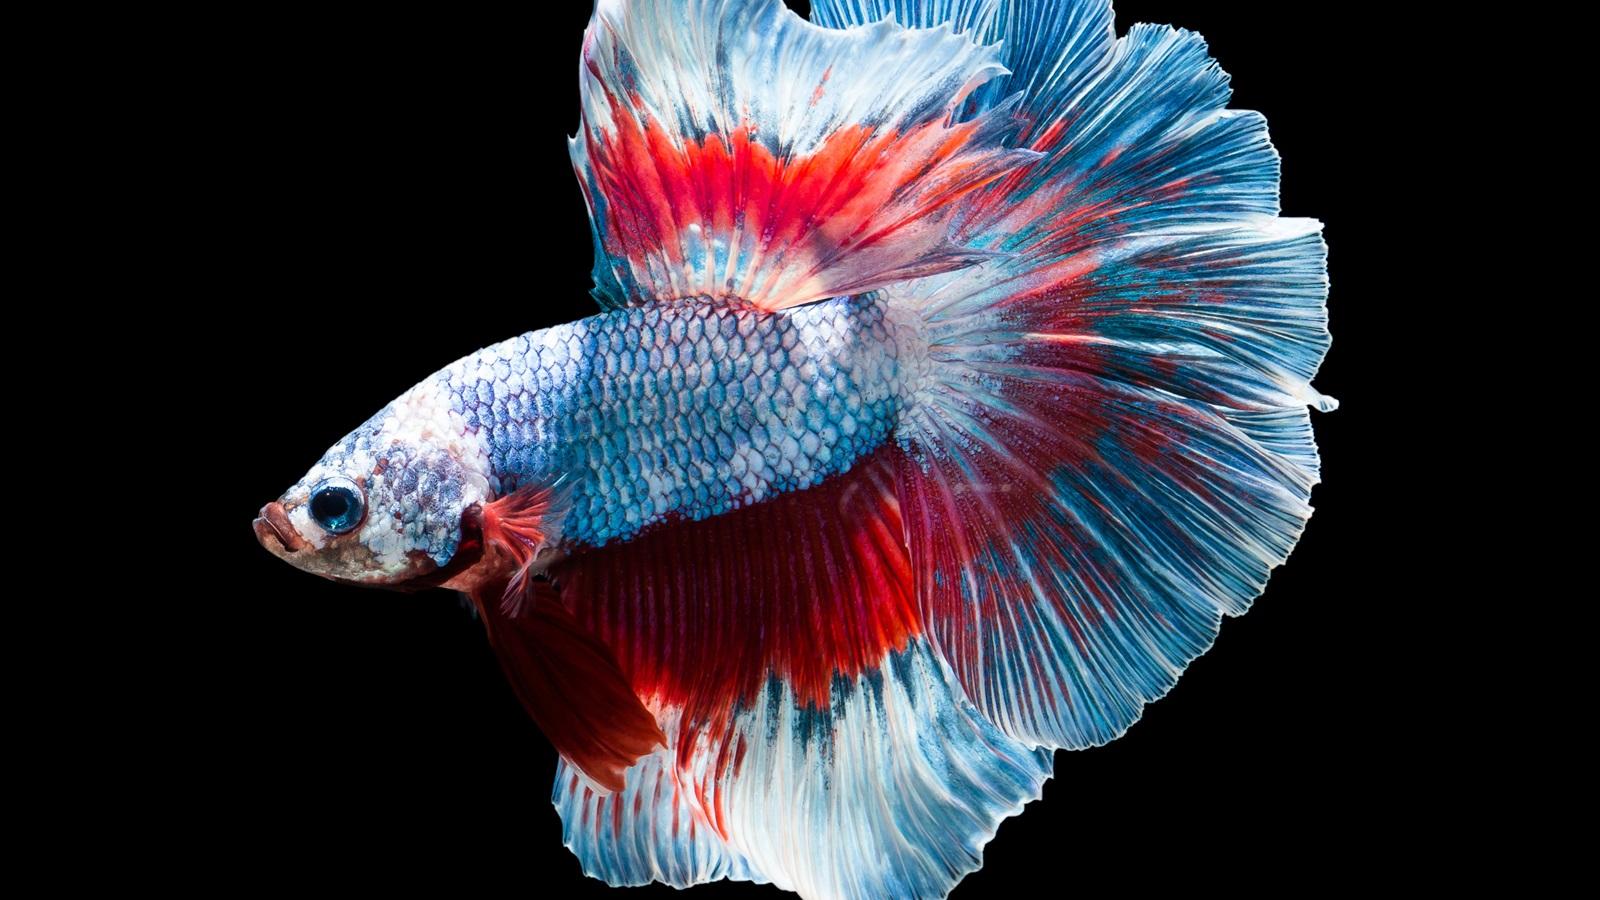 Pescado, colores, fondo negro Fondos de pantalla | 1600x900 Fondos ...